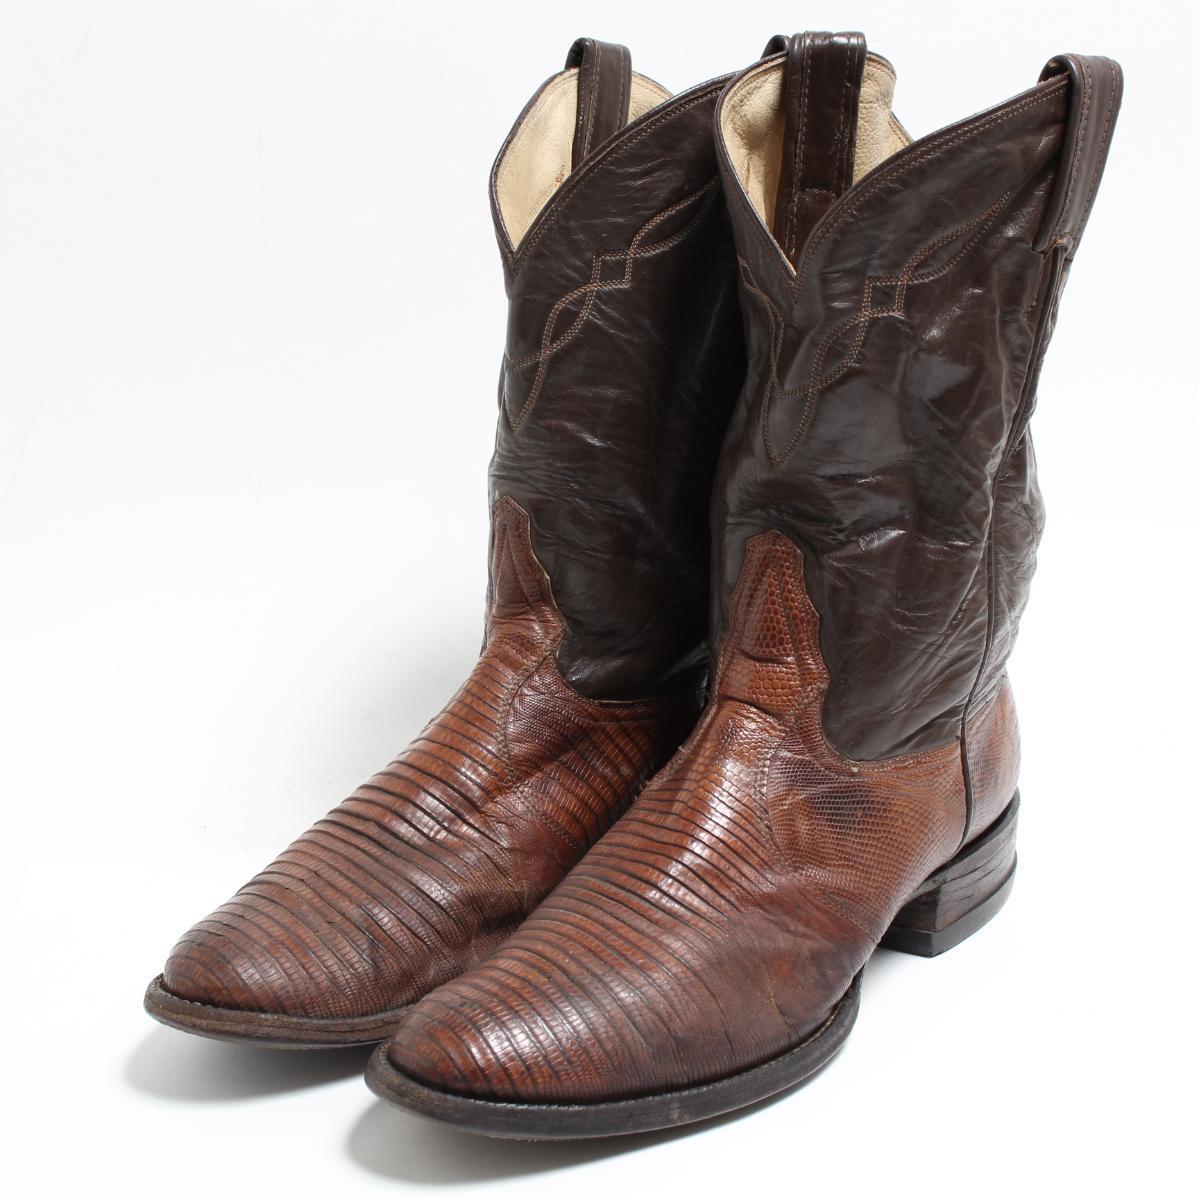 a3c8ec0f311 Tony llama Tony Lama gold label lizard leather western boots 8D men 26.5cm  vintage /bon6421